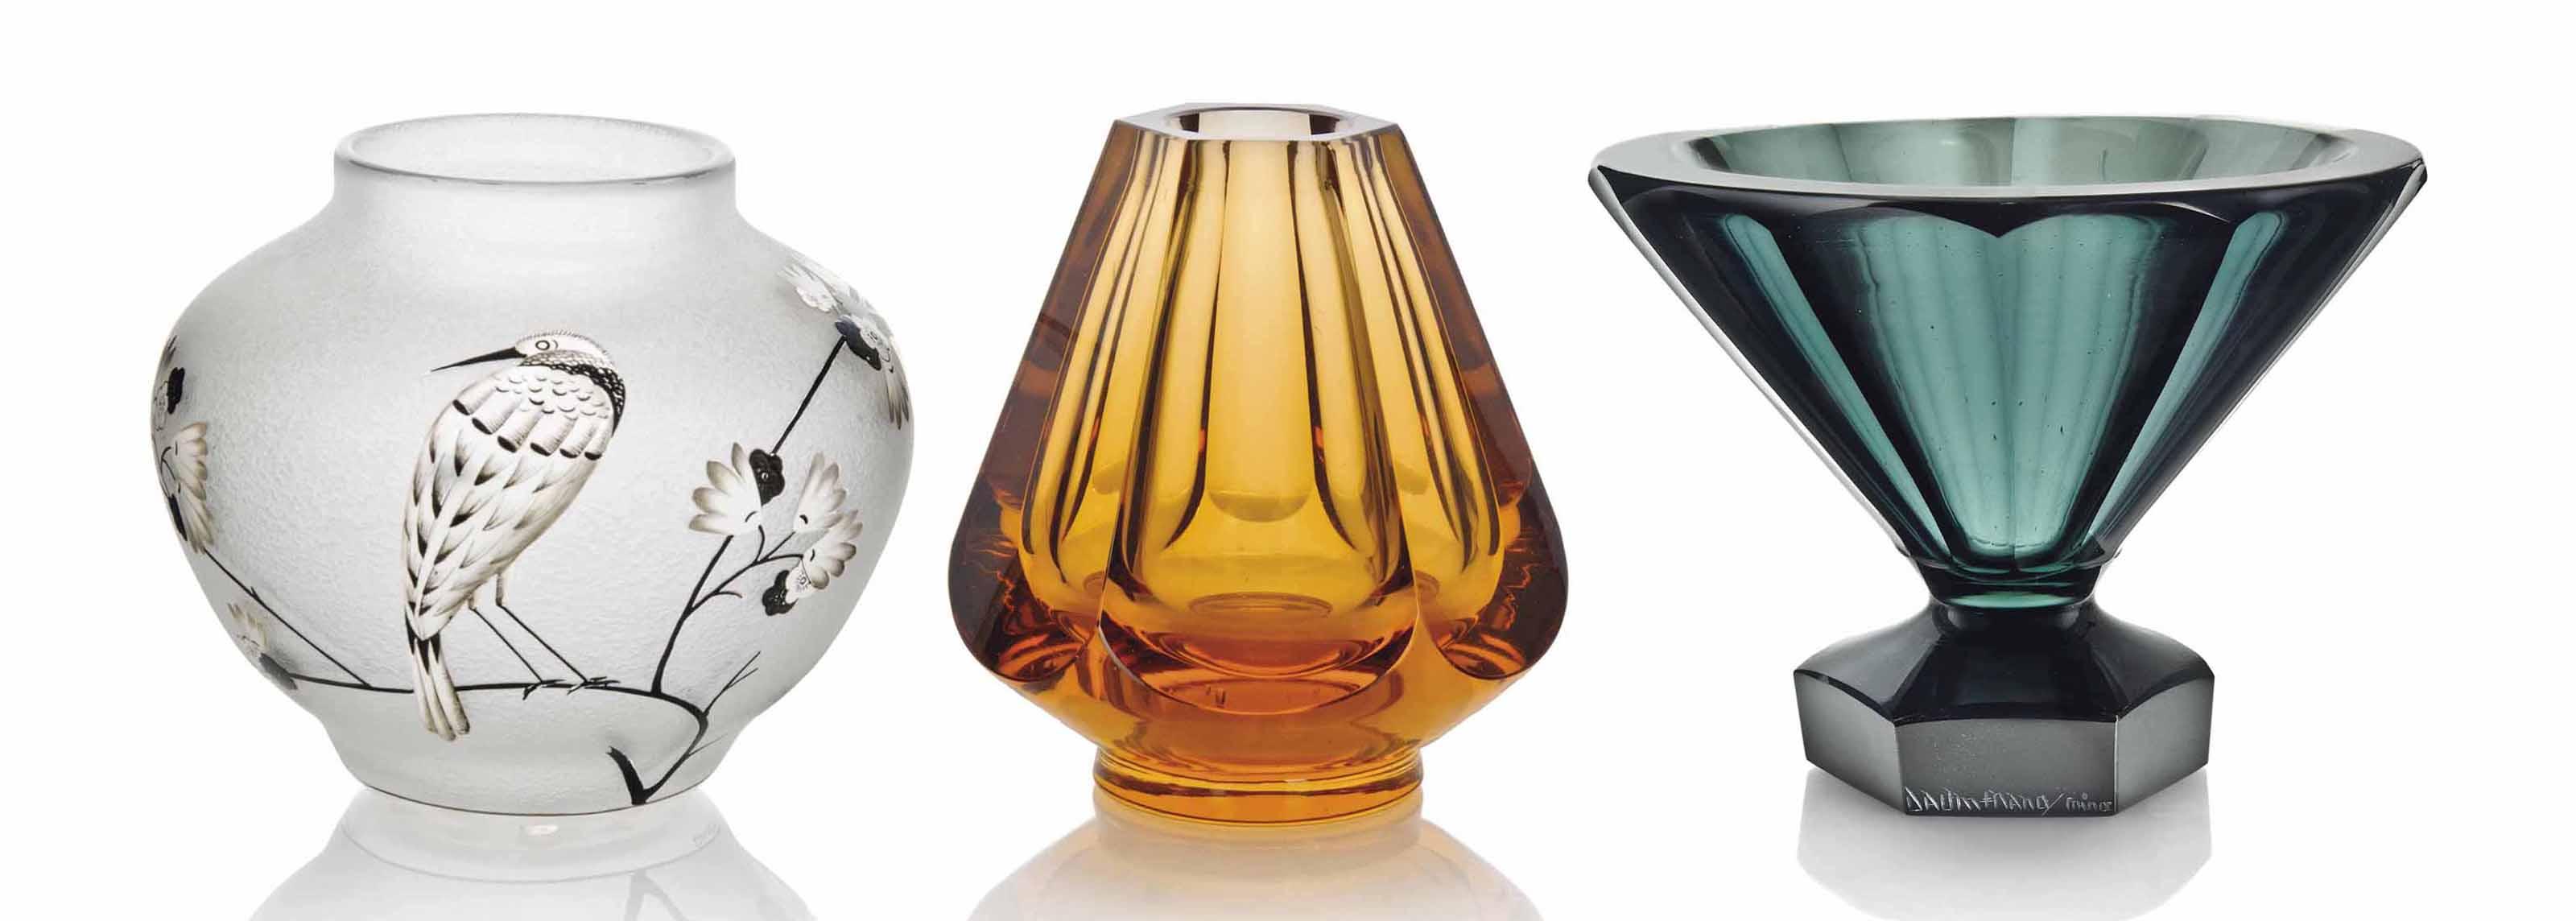 A DAUM ENAMELLED GLASS VASE AN